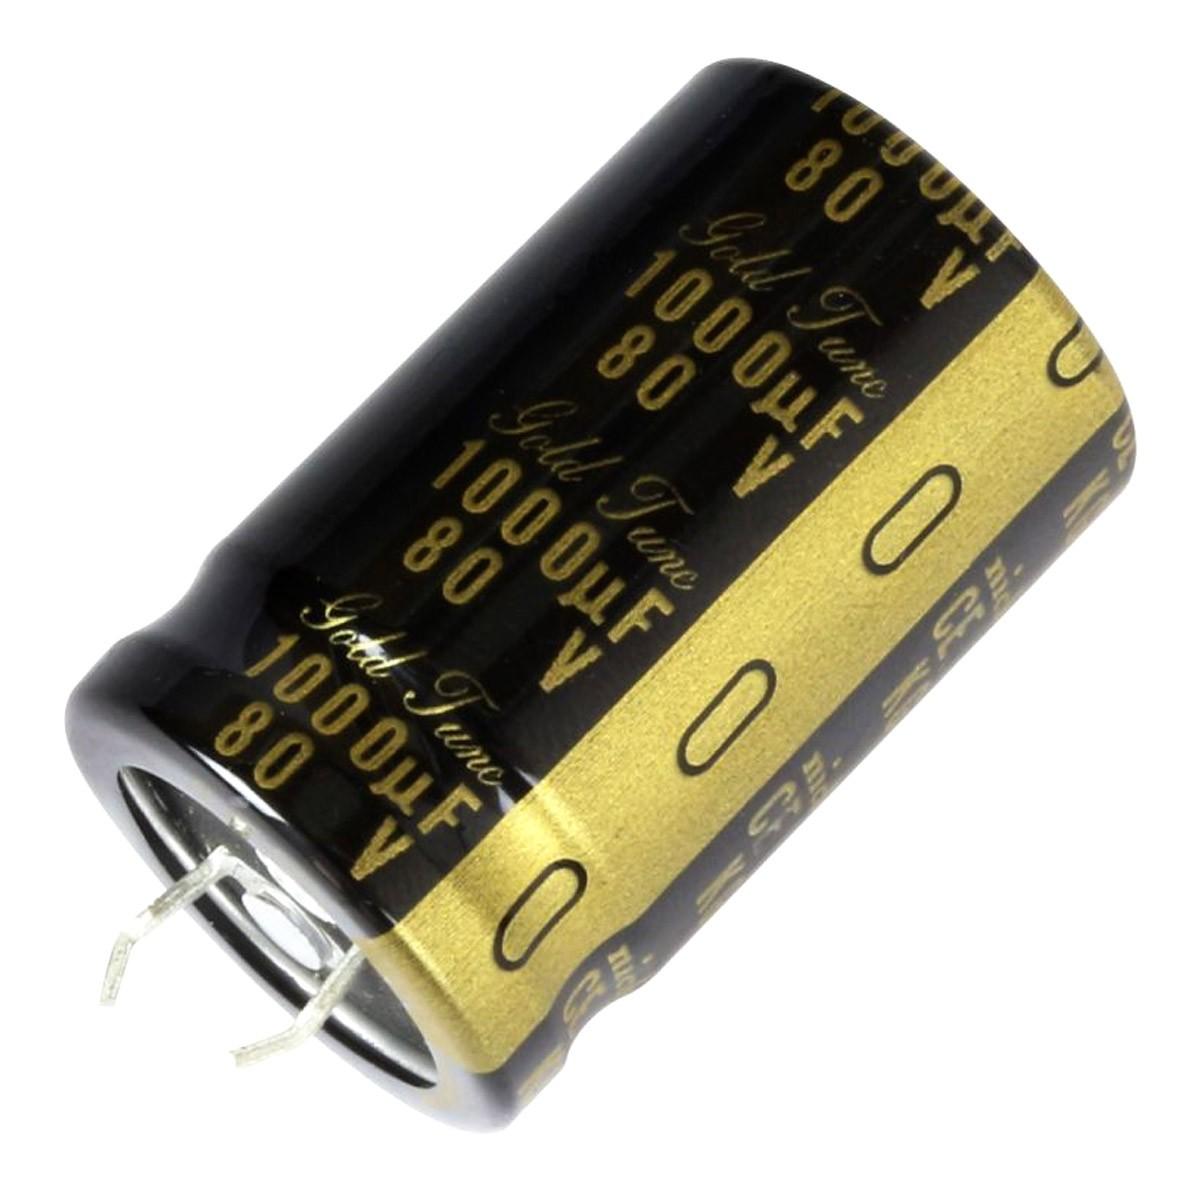 NICHICON KG GOLD TUNE Electrolytic Audio Capacitor 25V 3300µF